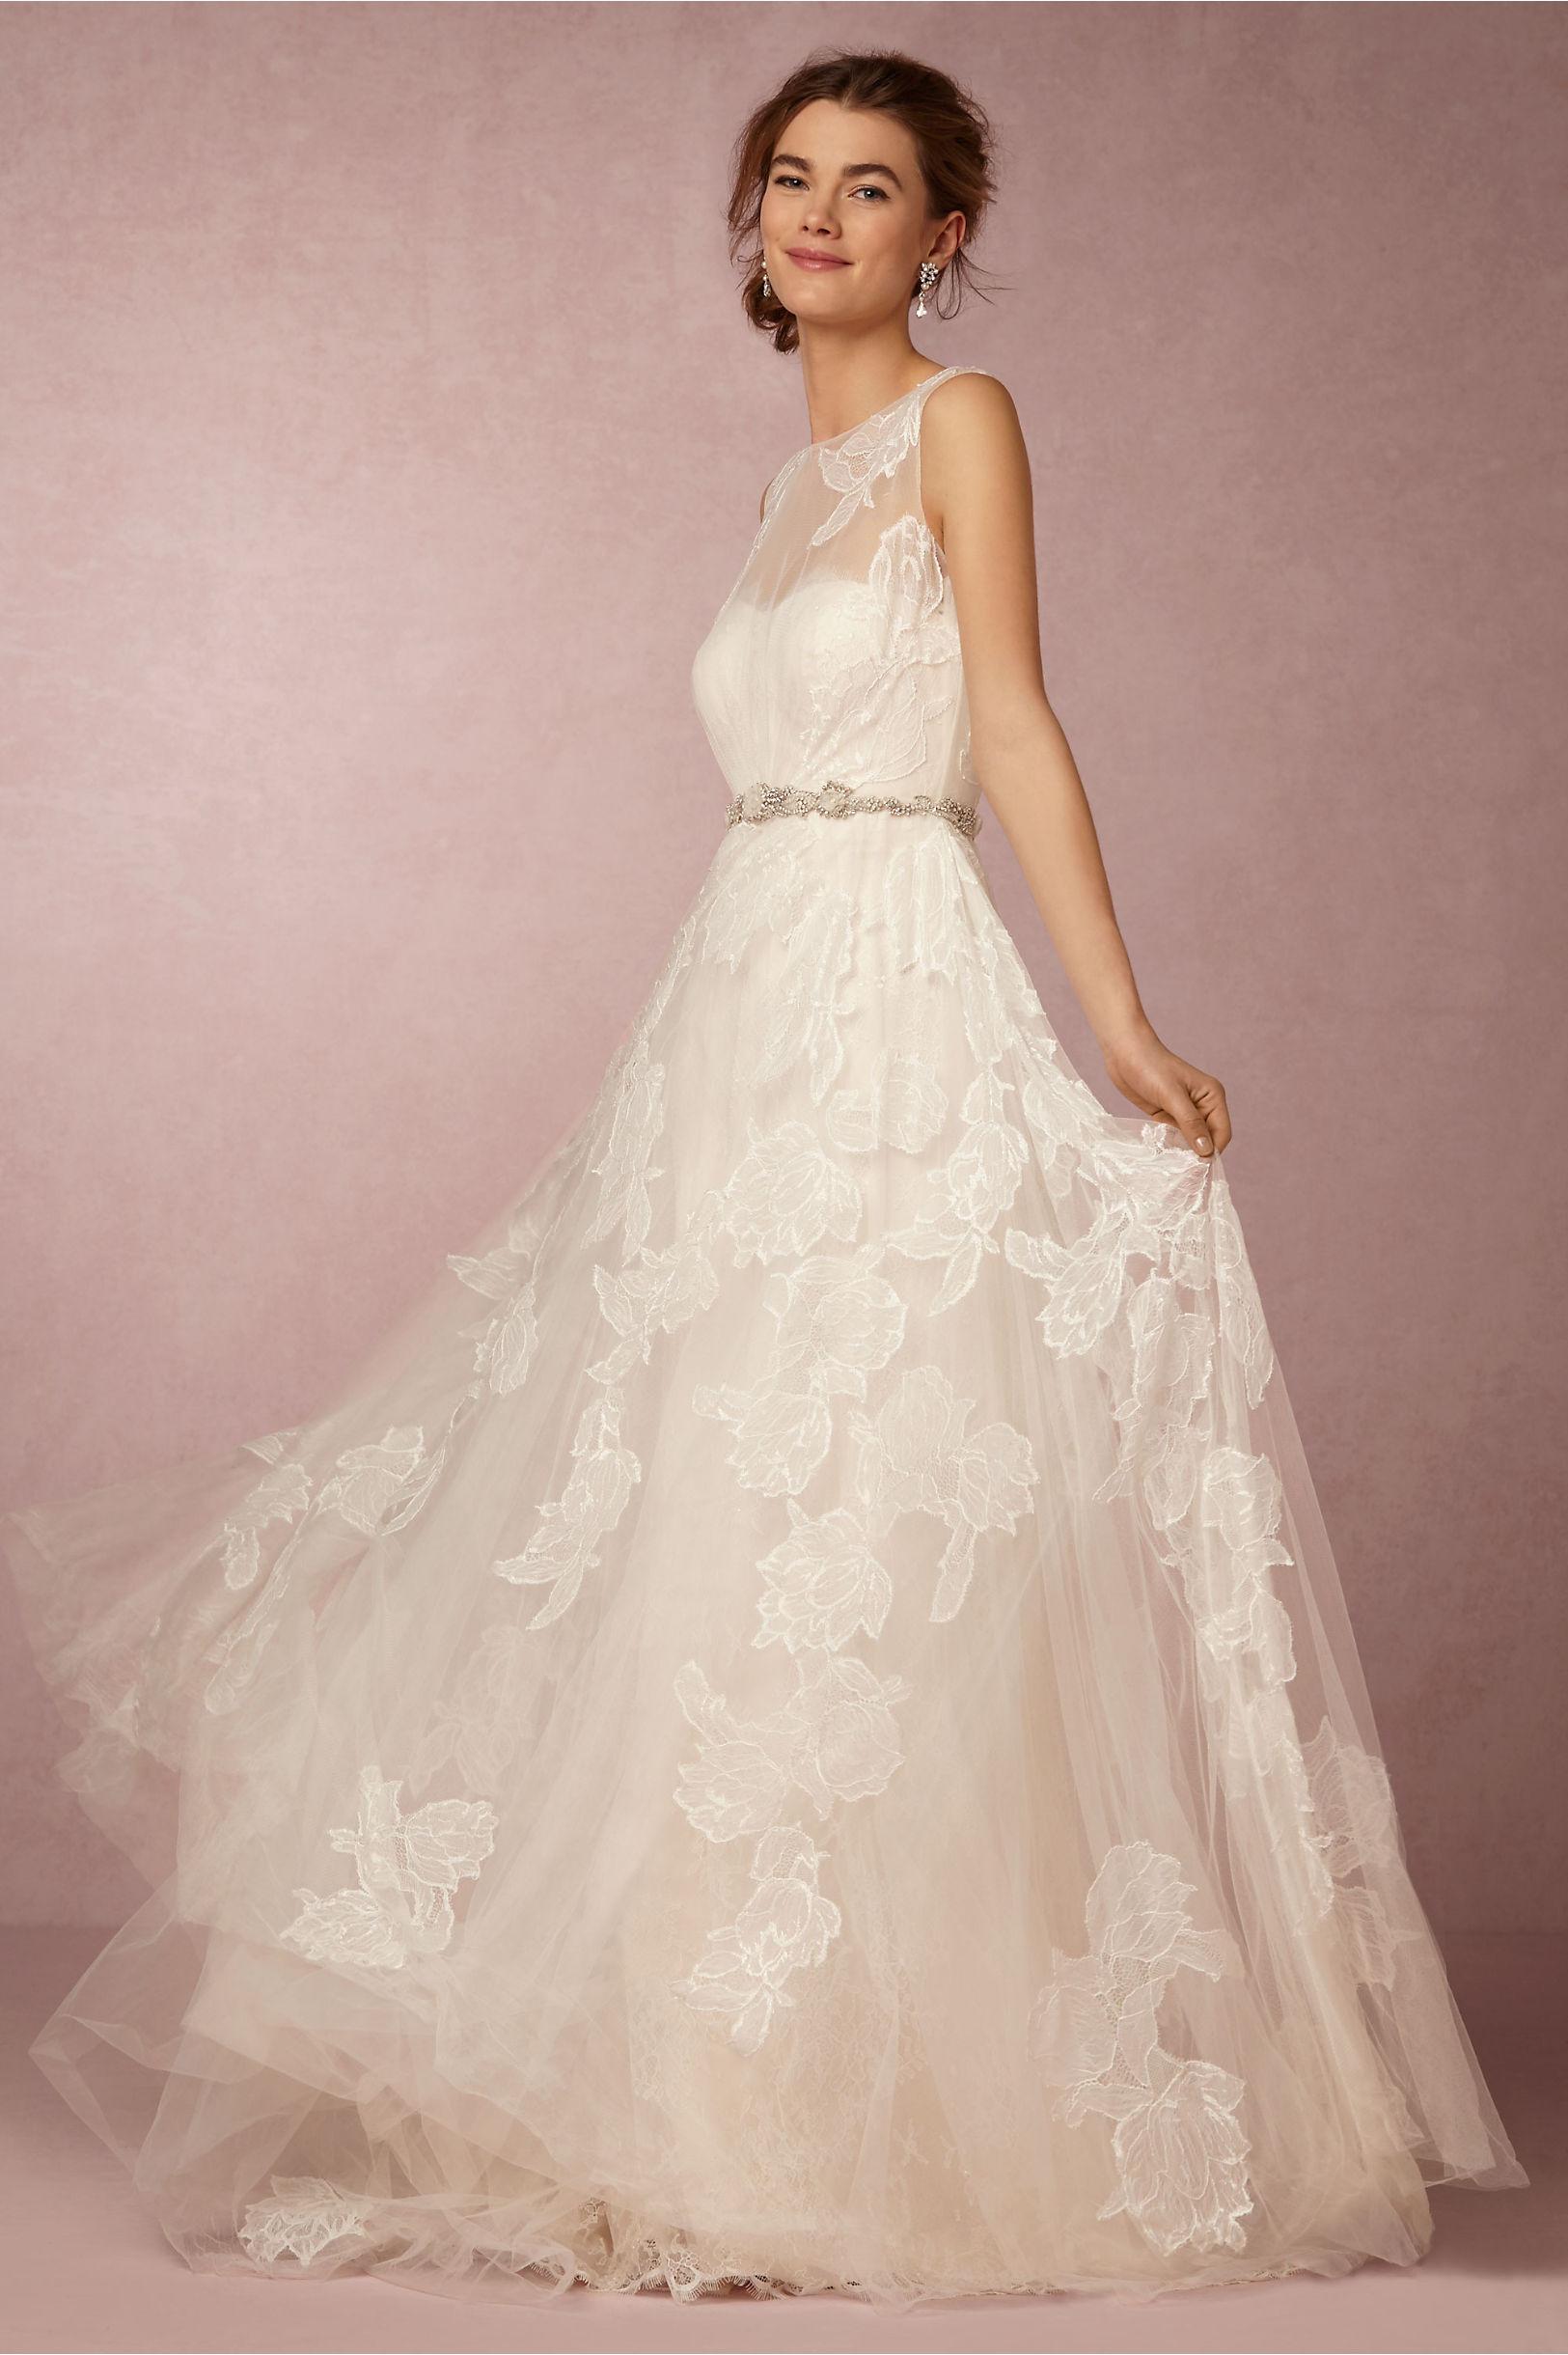 Seattle wedding dress sample sales dress online uk for Wedding dresses seattle washington